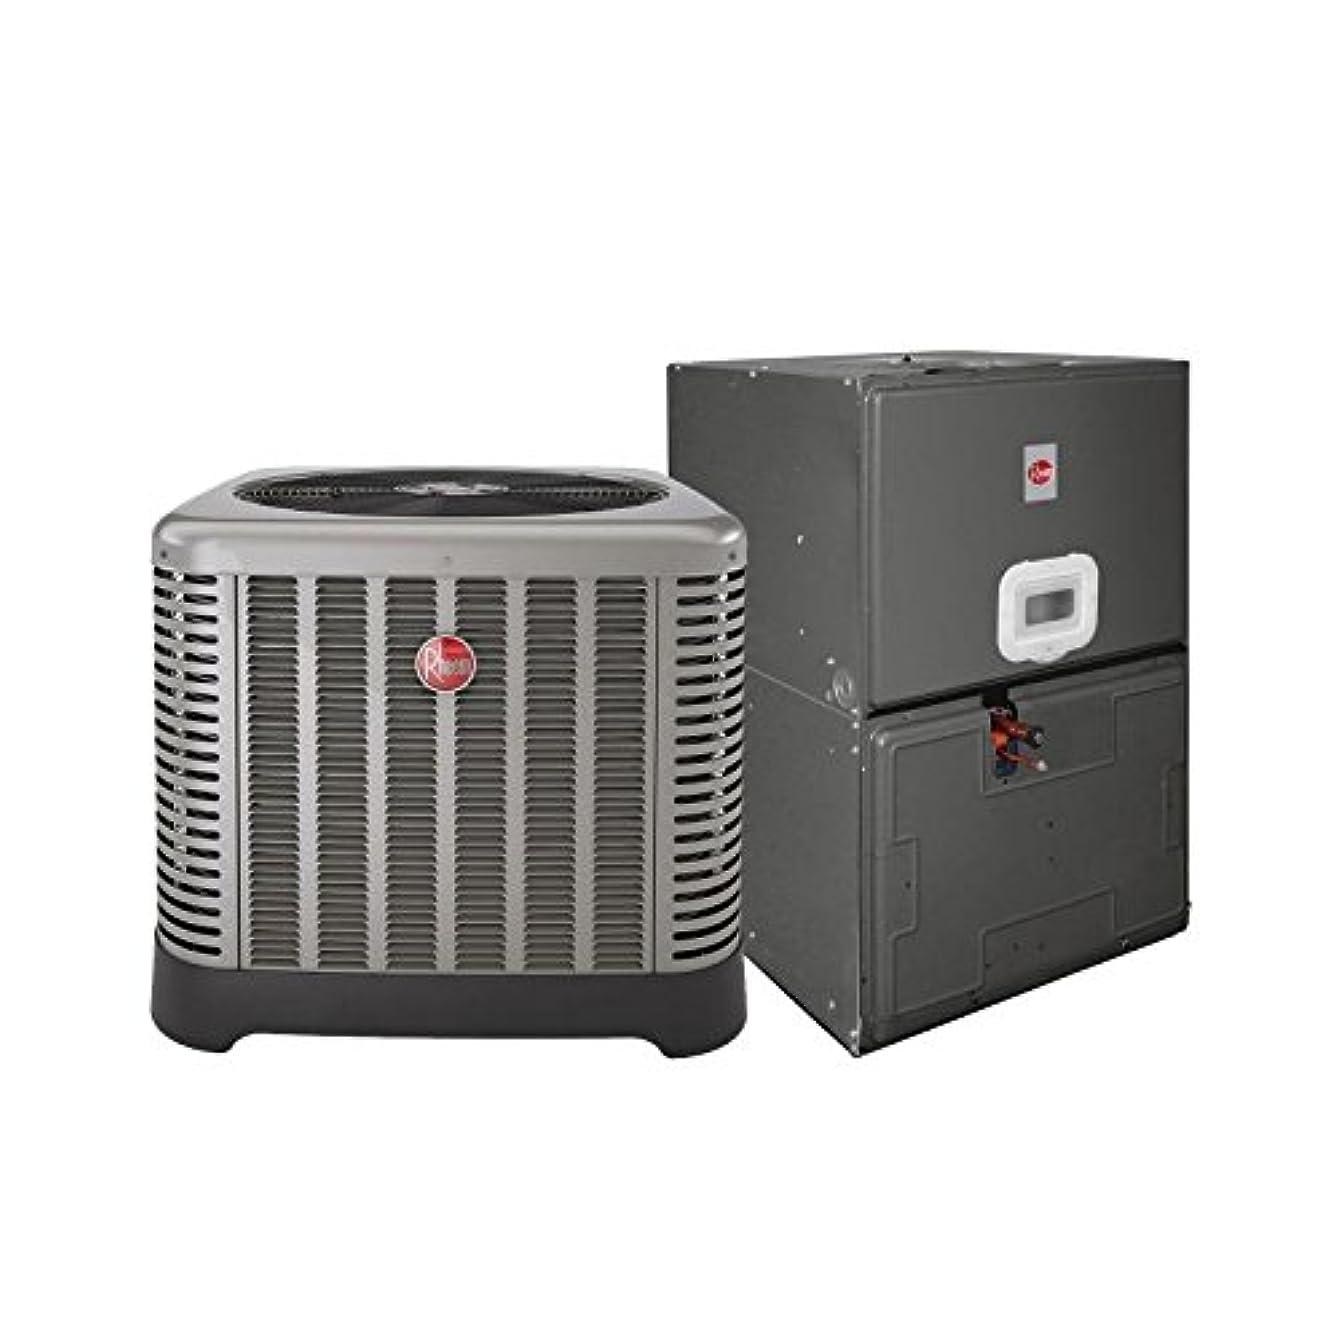 Rheem 3 Ton 15.5 Seer Ruud Air Conditioning System (AC only) RA1636AJ1NA - RBHP21J07SH2